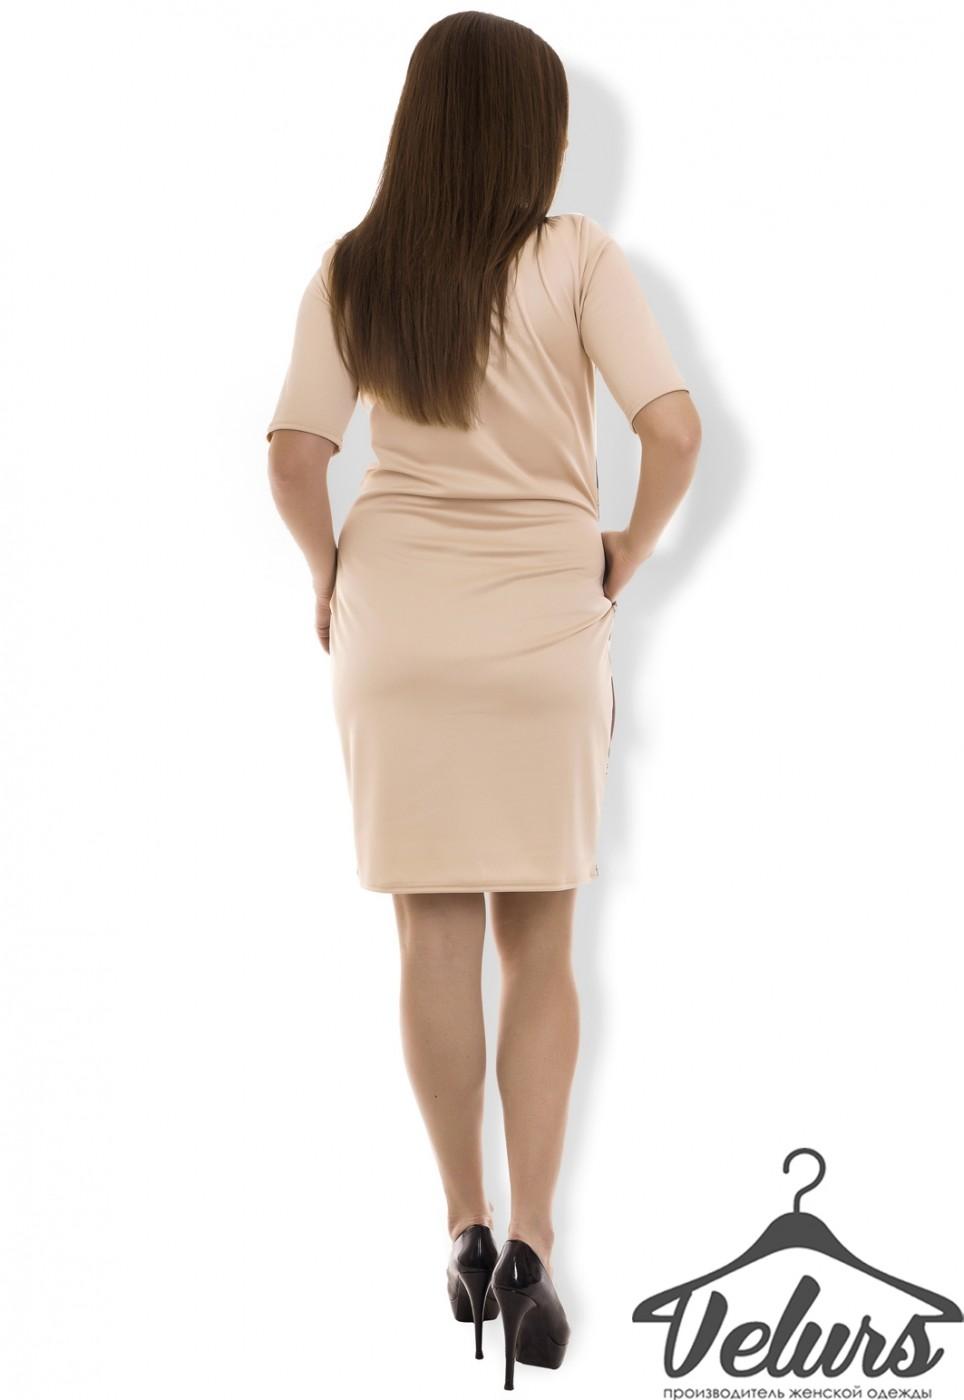 Velurs: Платье 212110 - фото 15